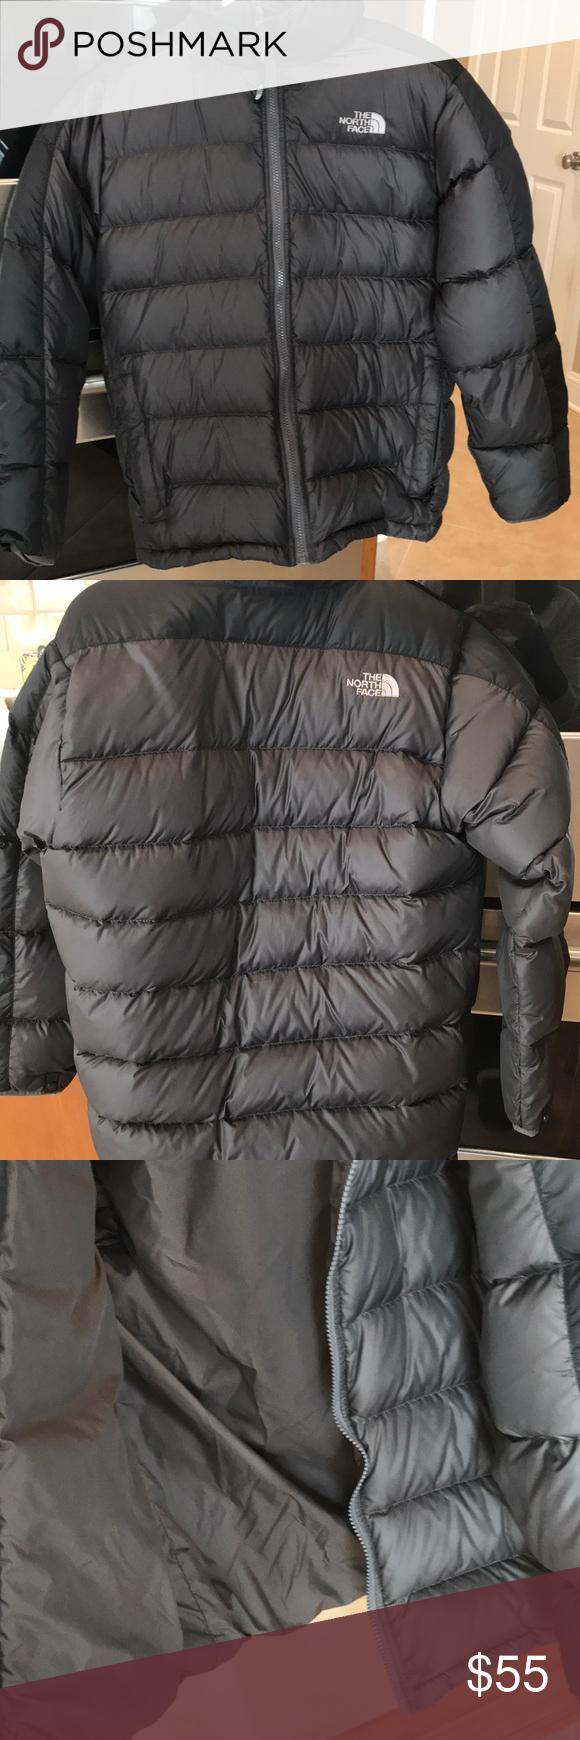 The North Face Boys Garcons 550 Clothes Design The North Face North Face Jacket [ 1740 x 580 Pixel ]